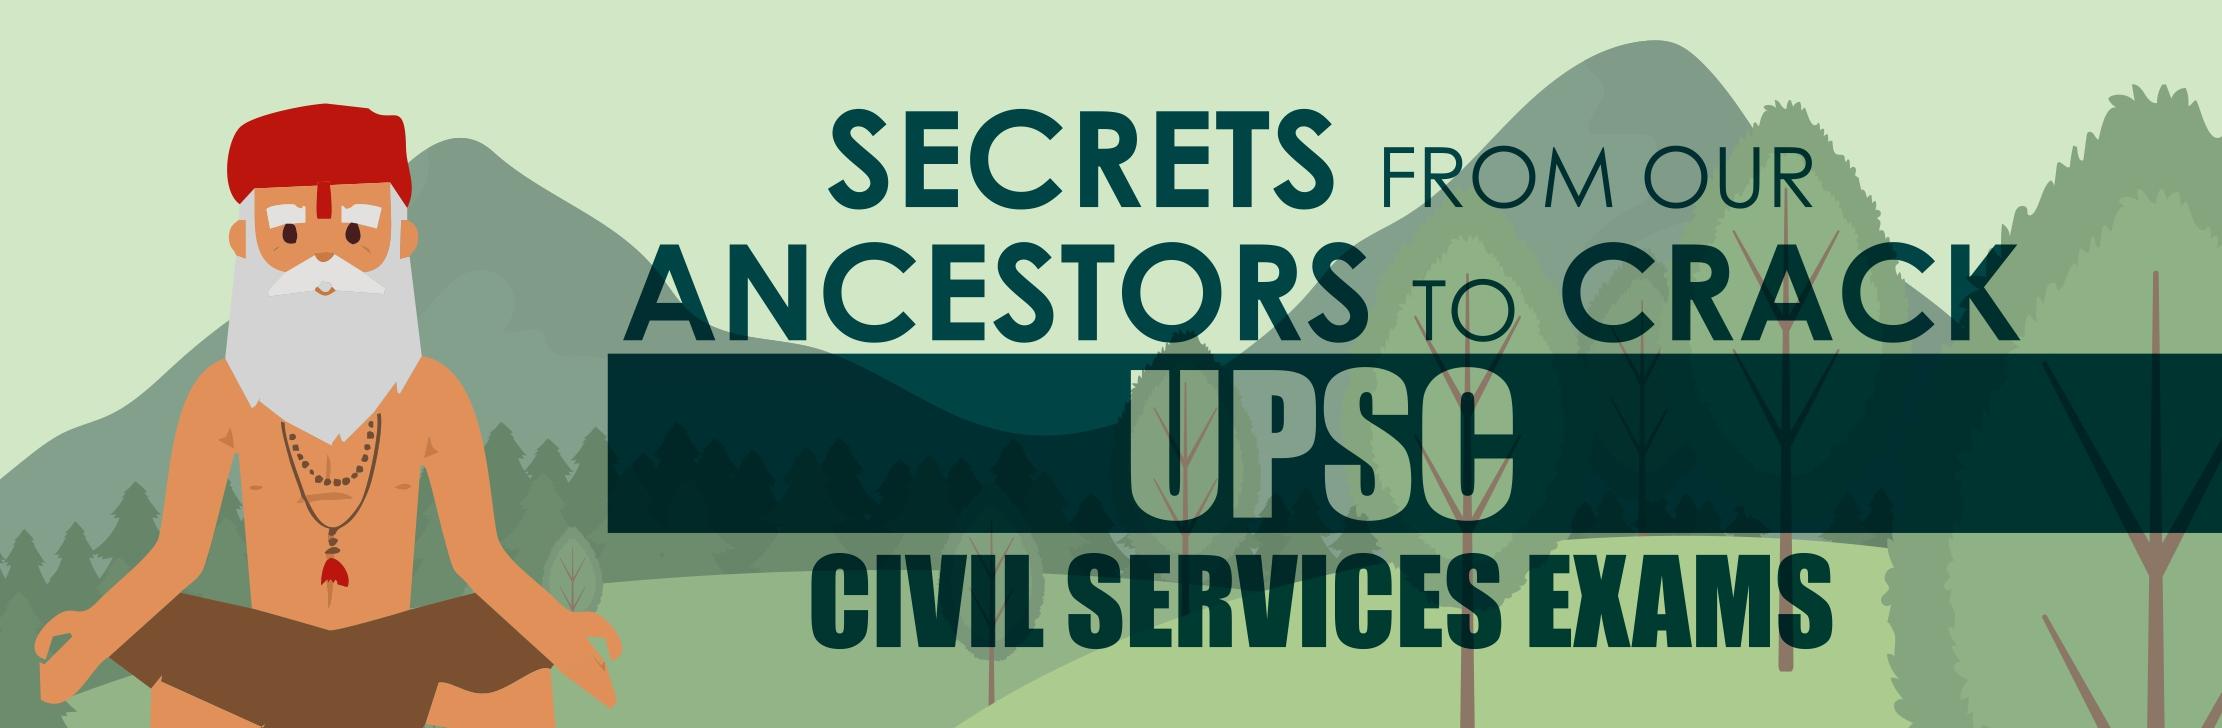 Upsc - Secrets From Our Ancestors To Crack Upsc Civil Services Exams